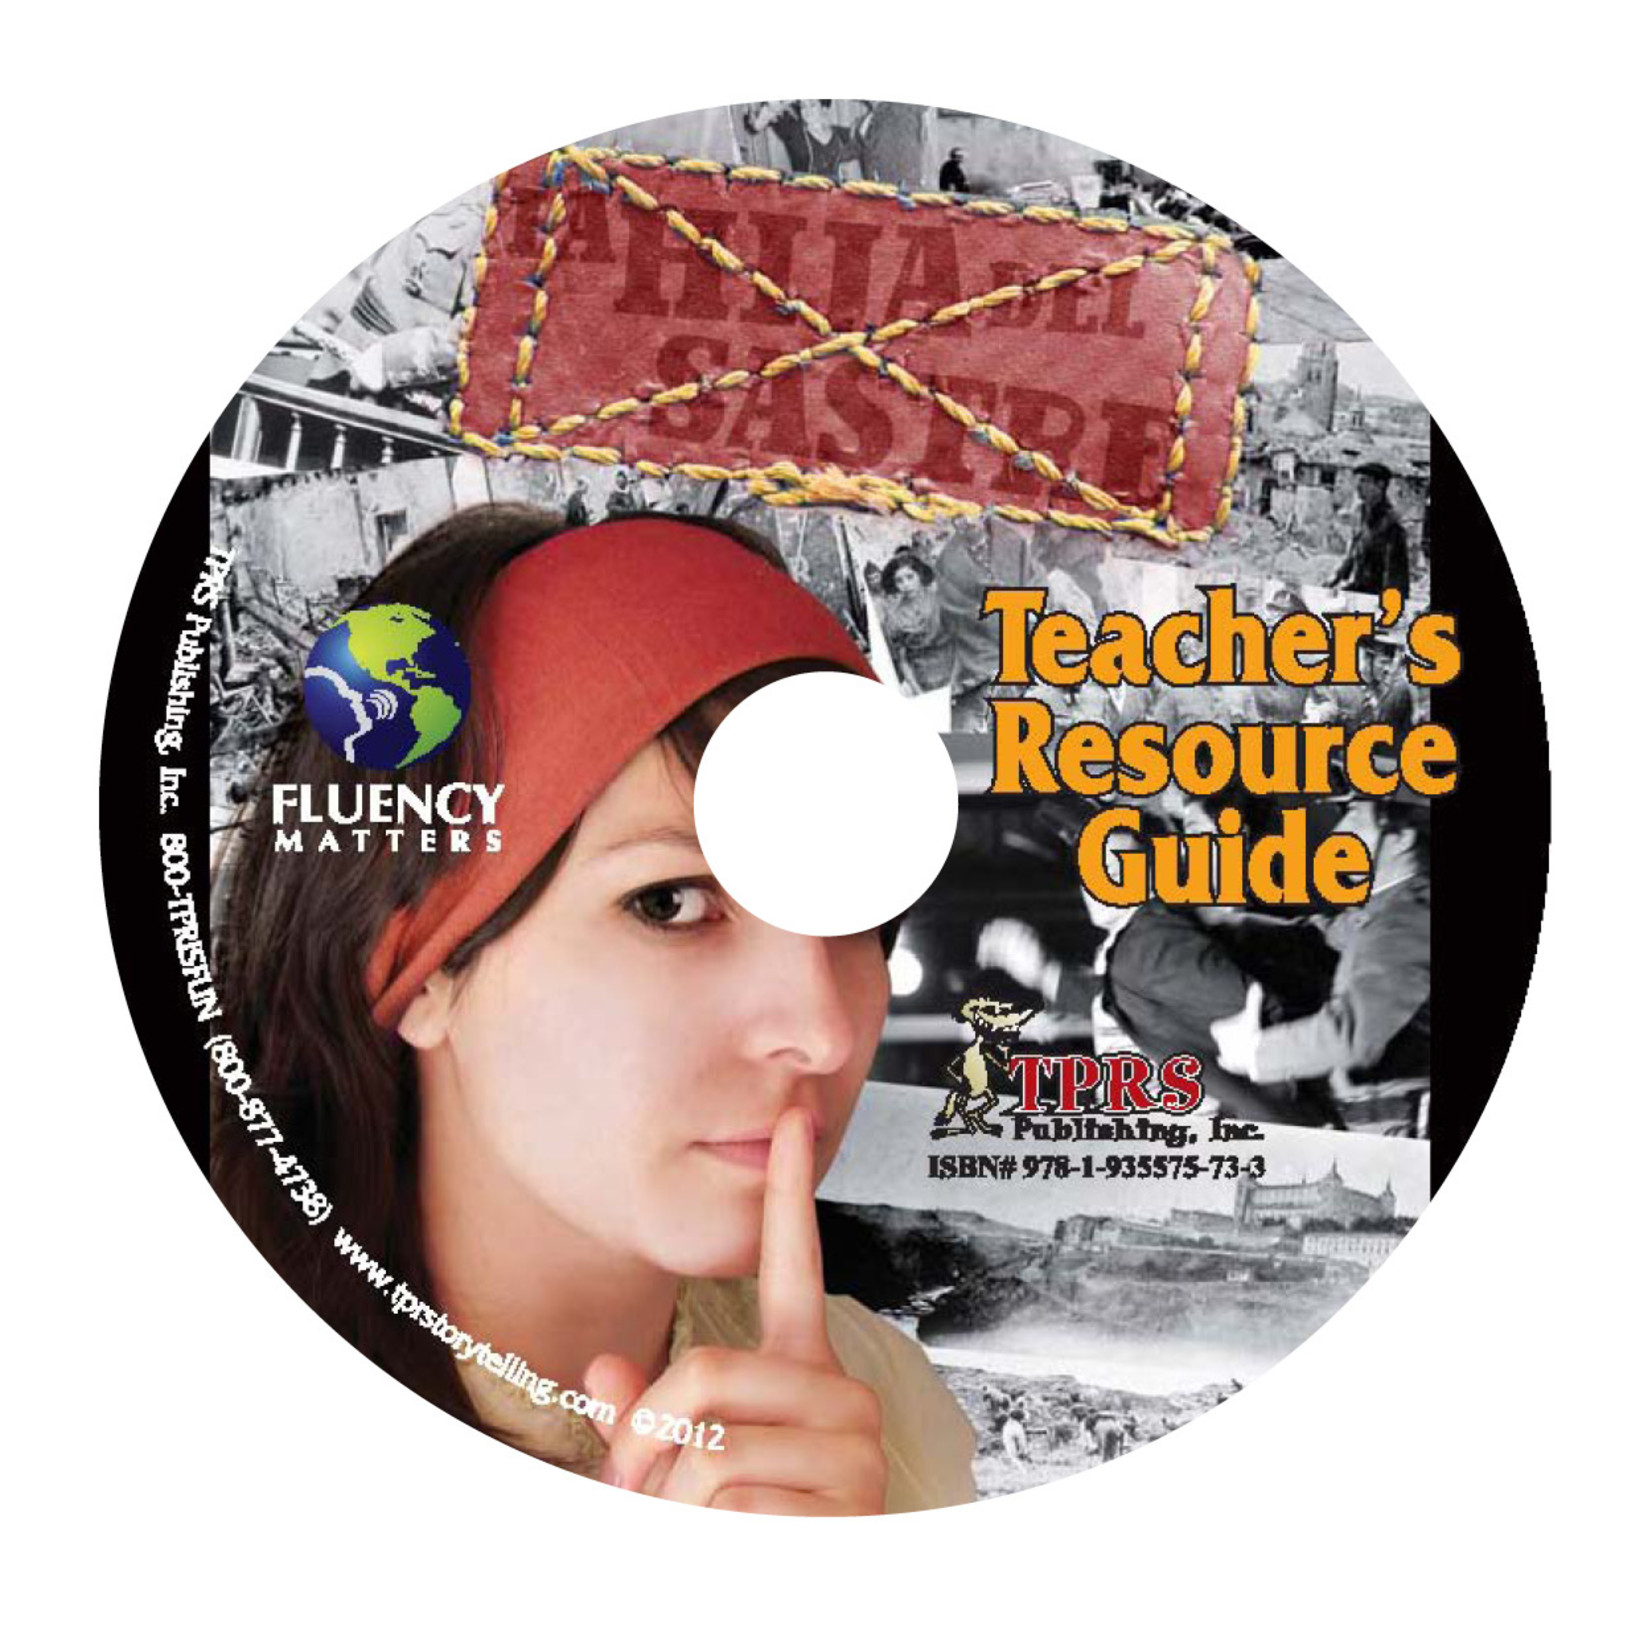 Fluency Matters La hija del sastre - Docentenhandleiding